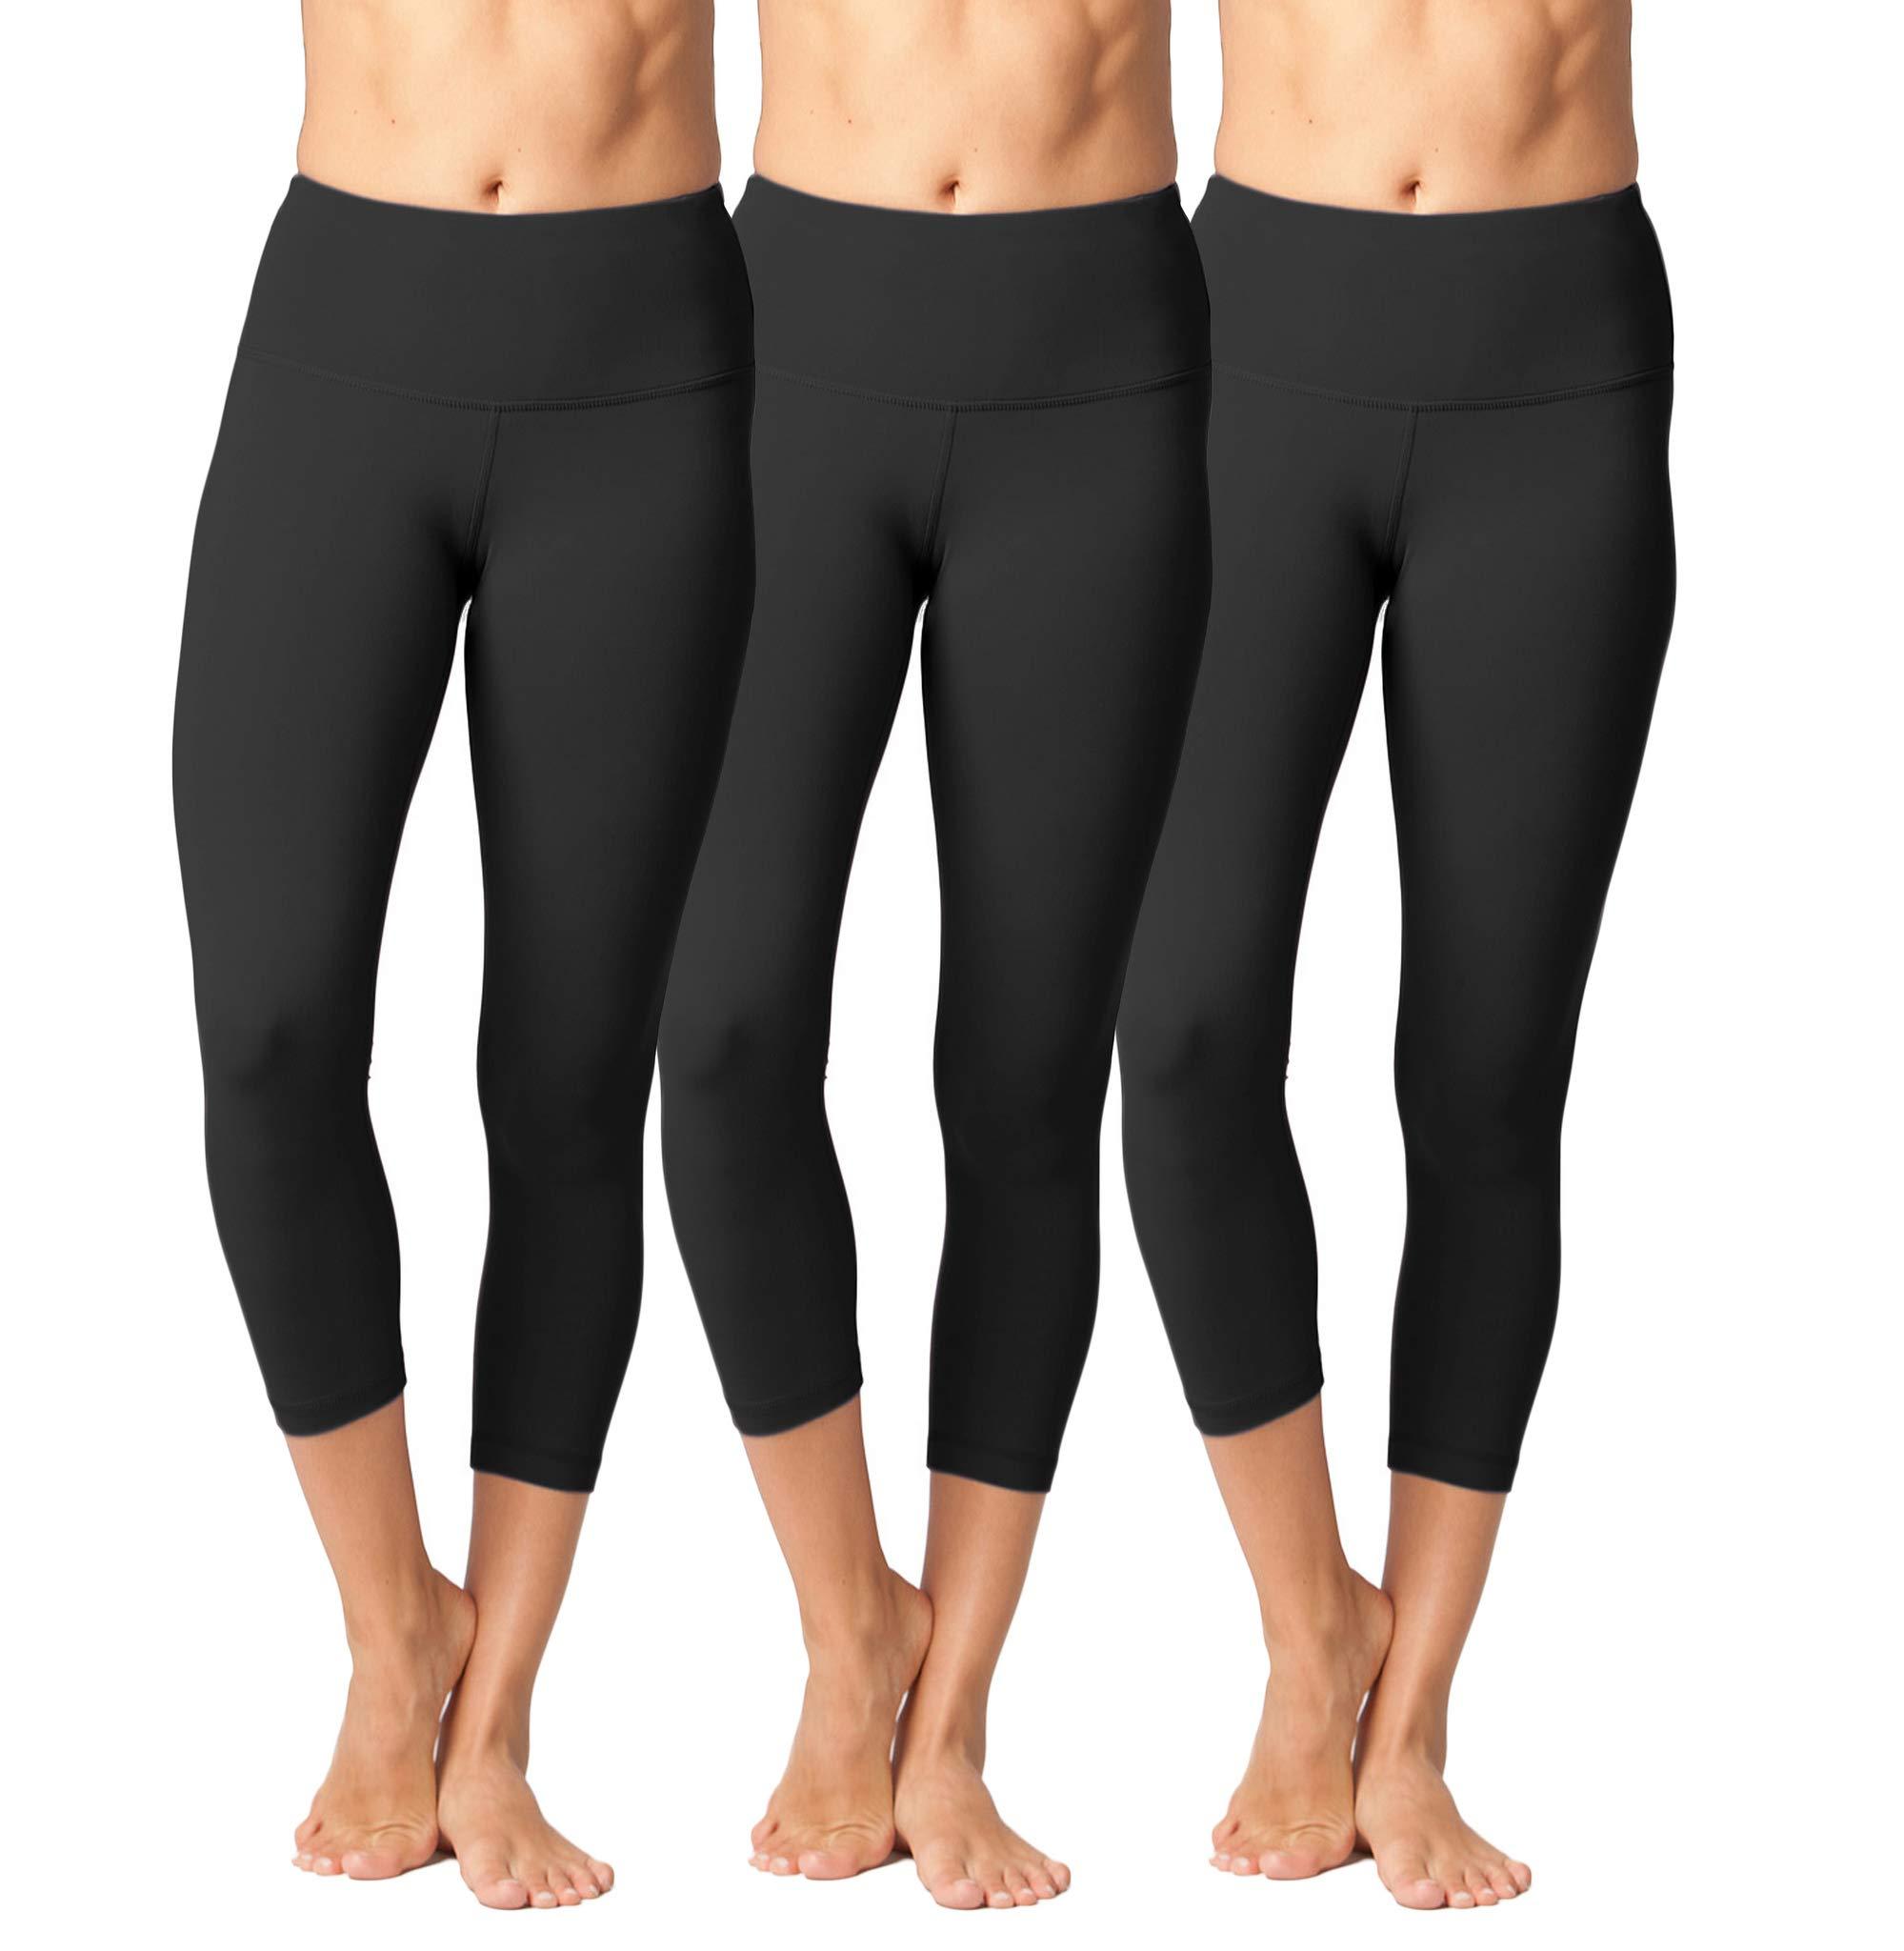 e66d90b3878d51 Yogalicious High Waist Ultra Soft Lightweight Capris - High Rise Yoga Pants  product image